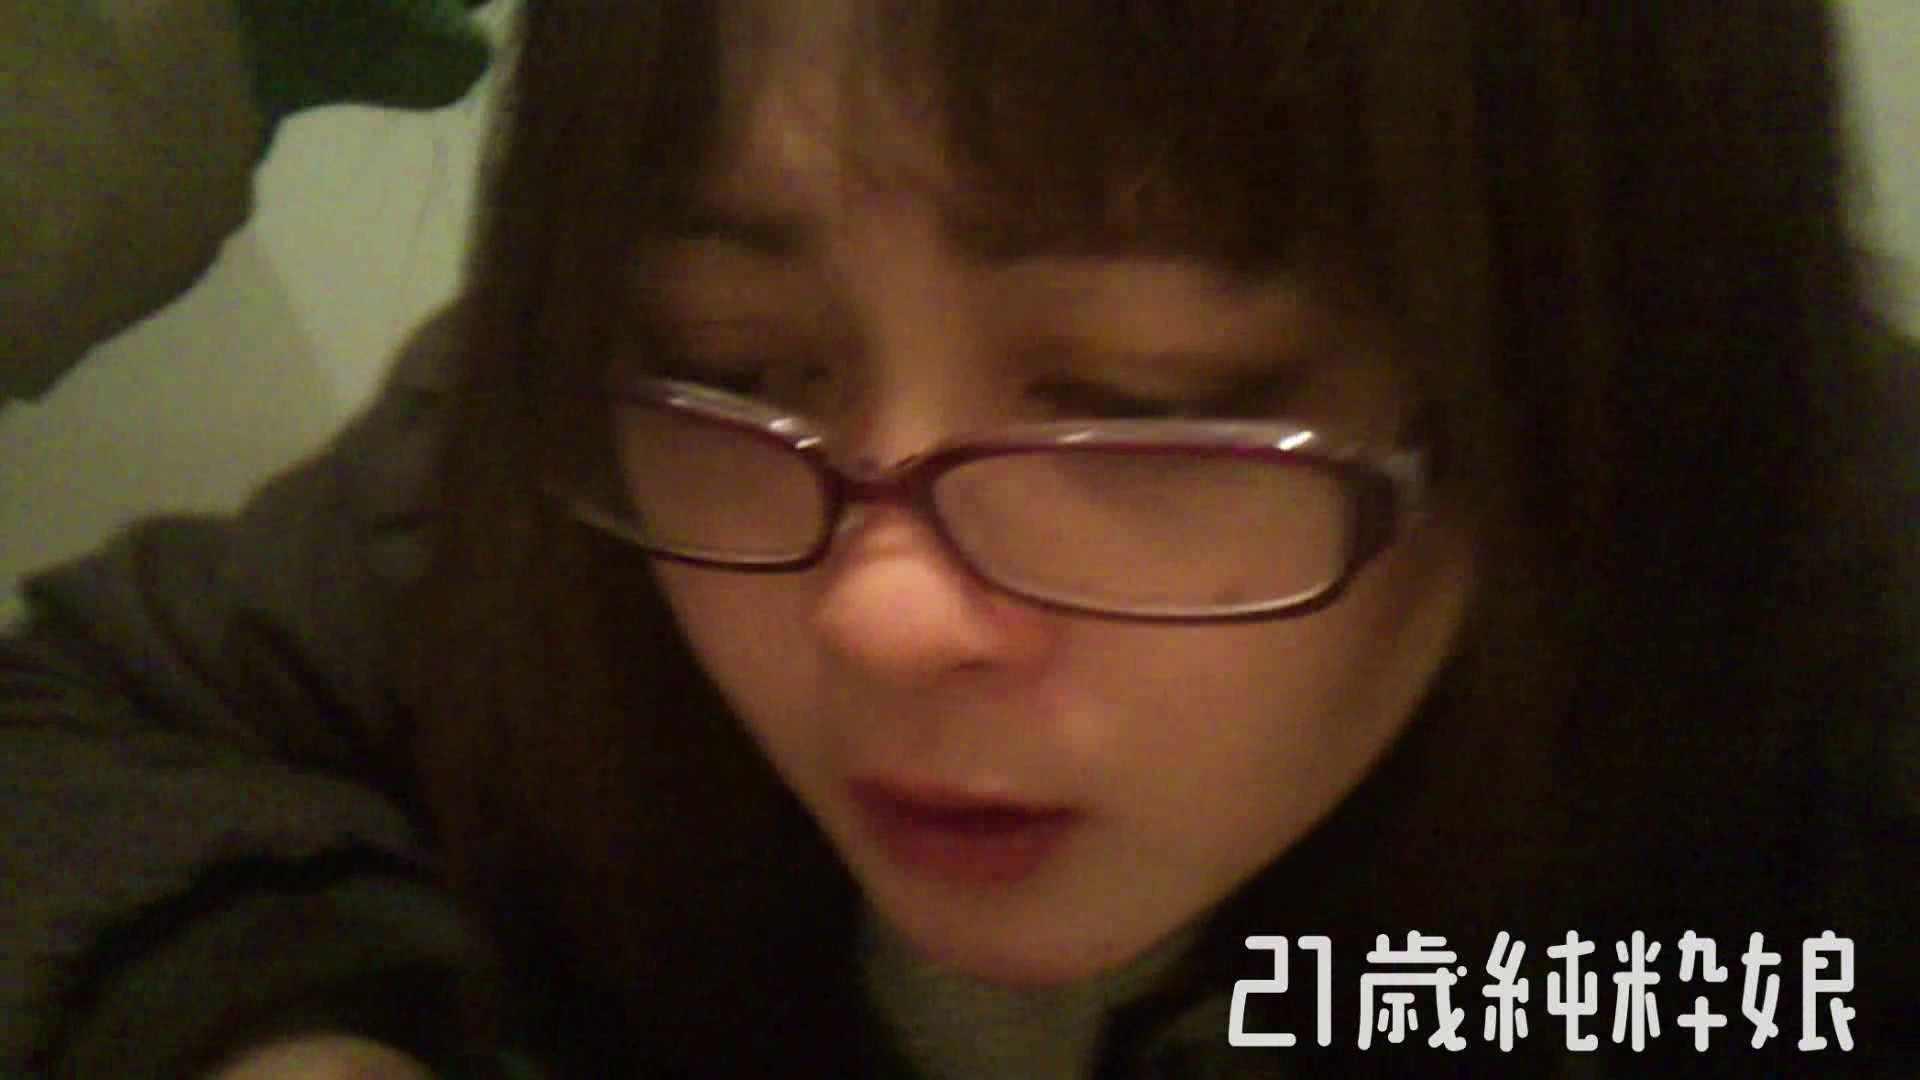 Gカップ21歳純粋嬢第2弾Vol.5 OLヌード天国 | 学校  110PIX 65